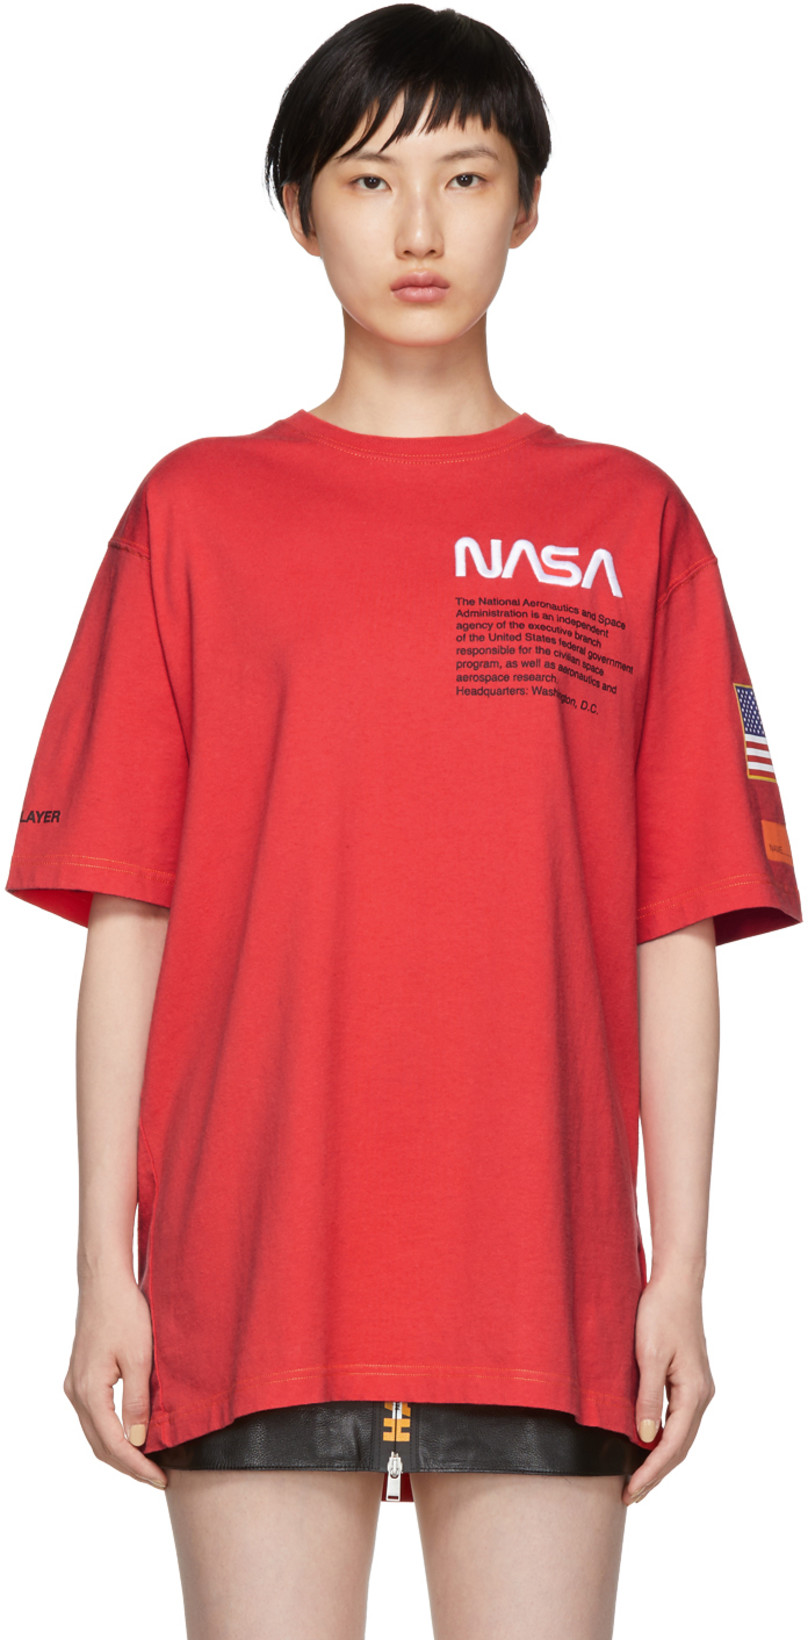 CNK-HP-NASA-7.jpg